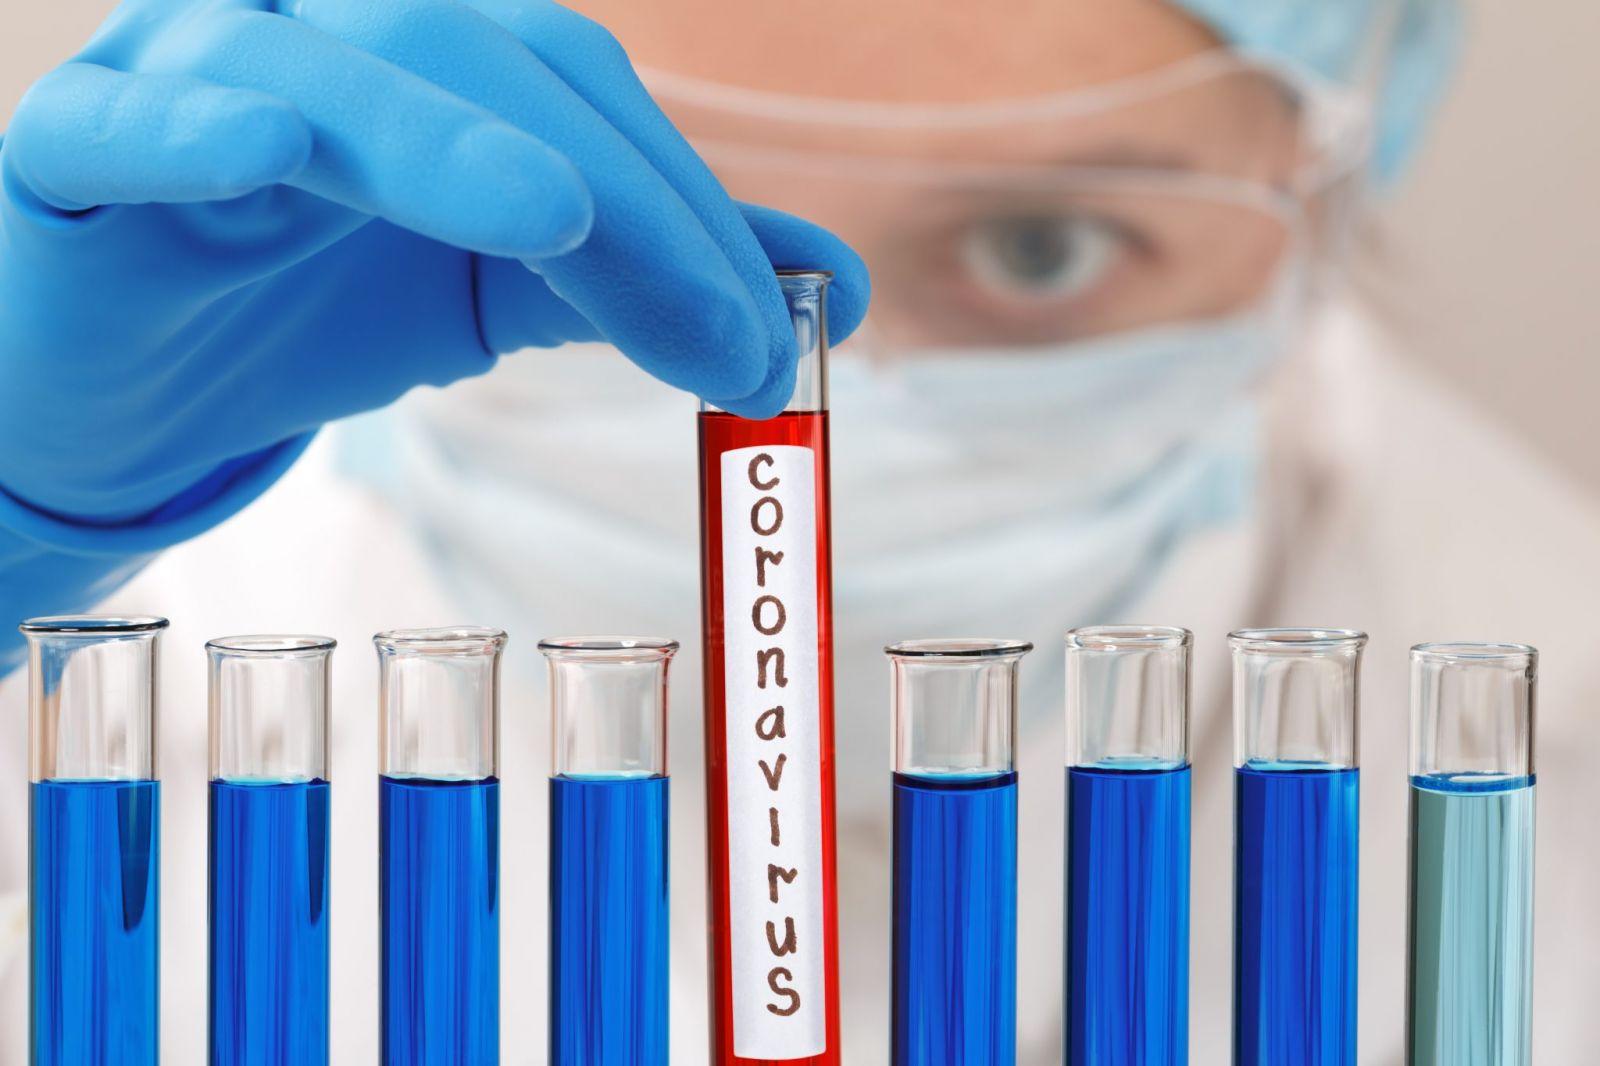 Мутации коронавируса COVID-19 пока не обнаружены, – ВОЗ